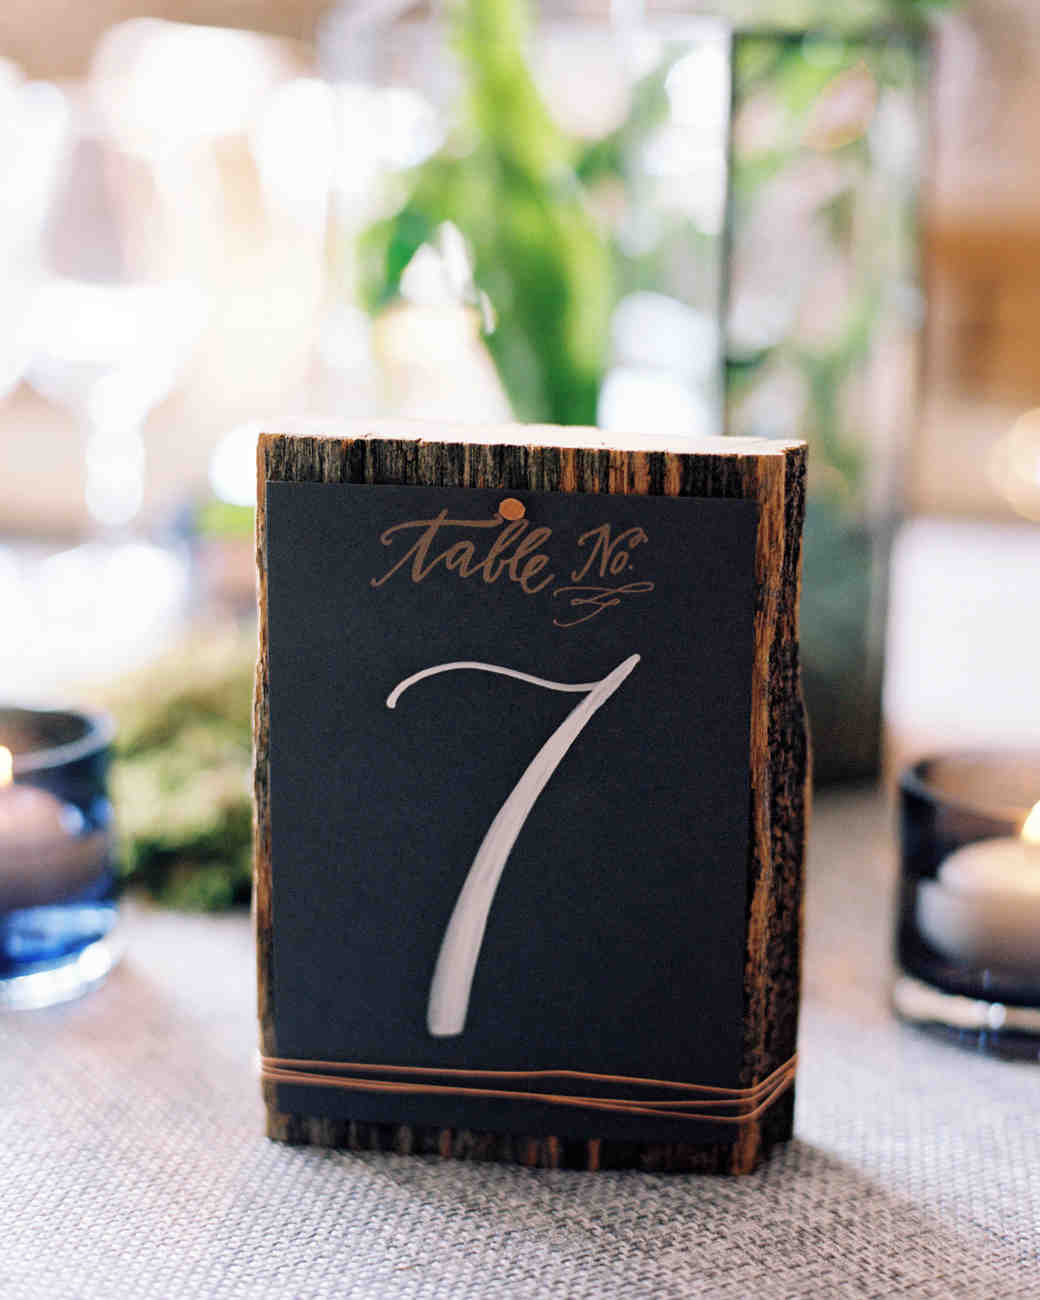 shannon-ryan-wedding-tablenumber-347-s111853-0415.jpg